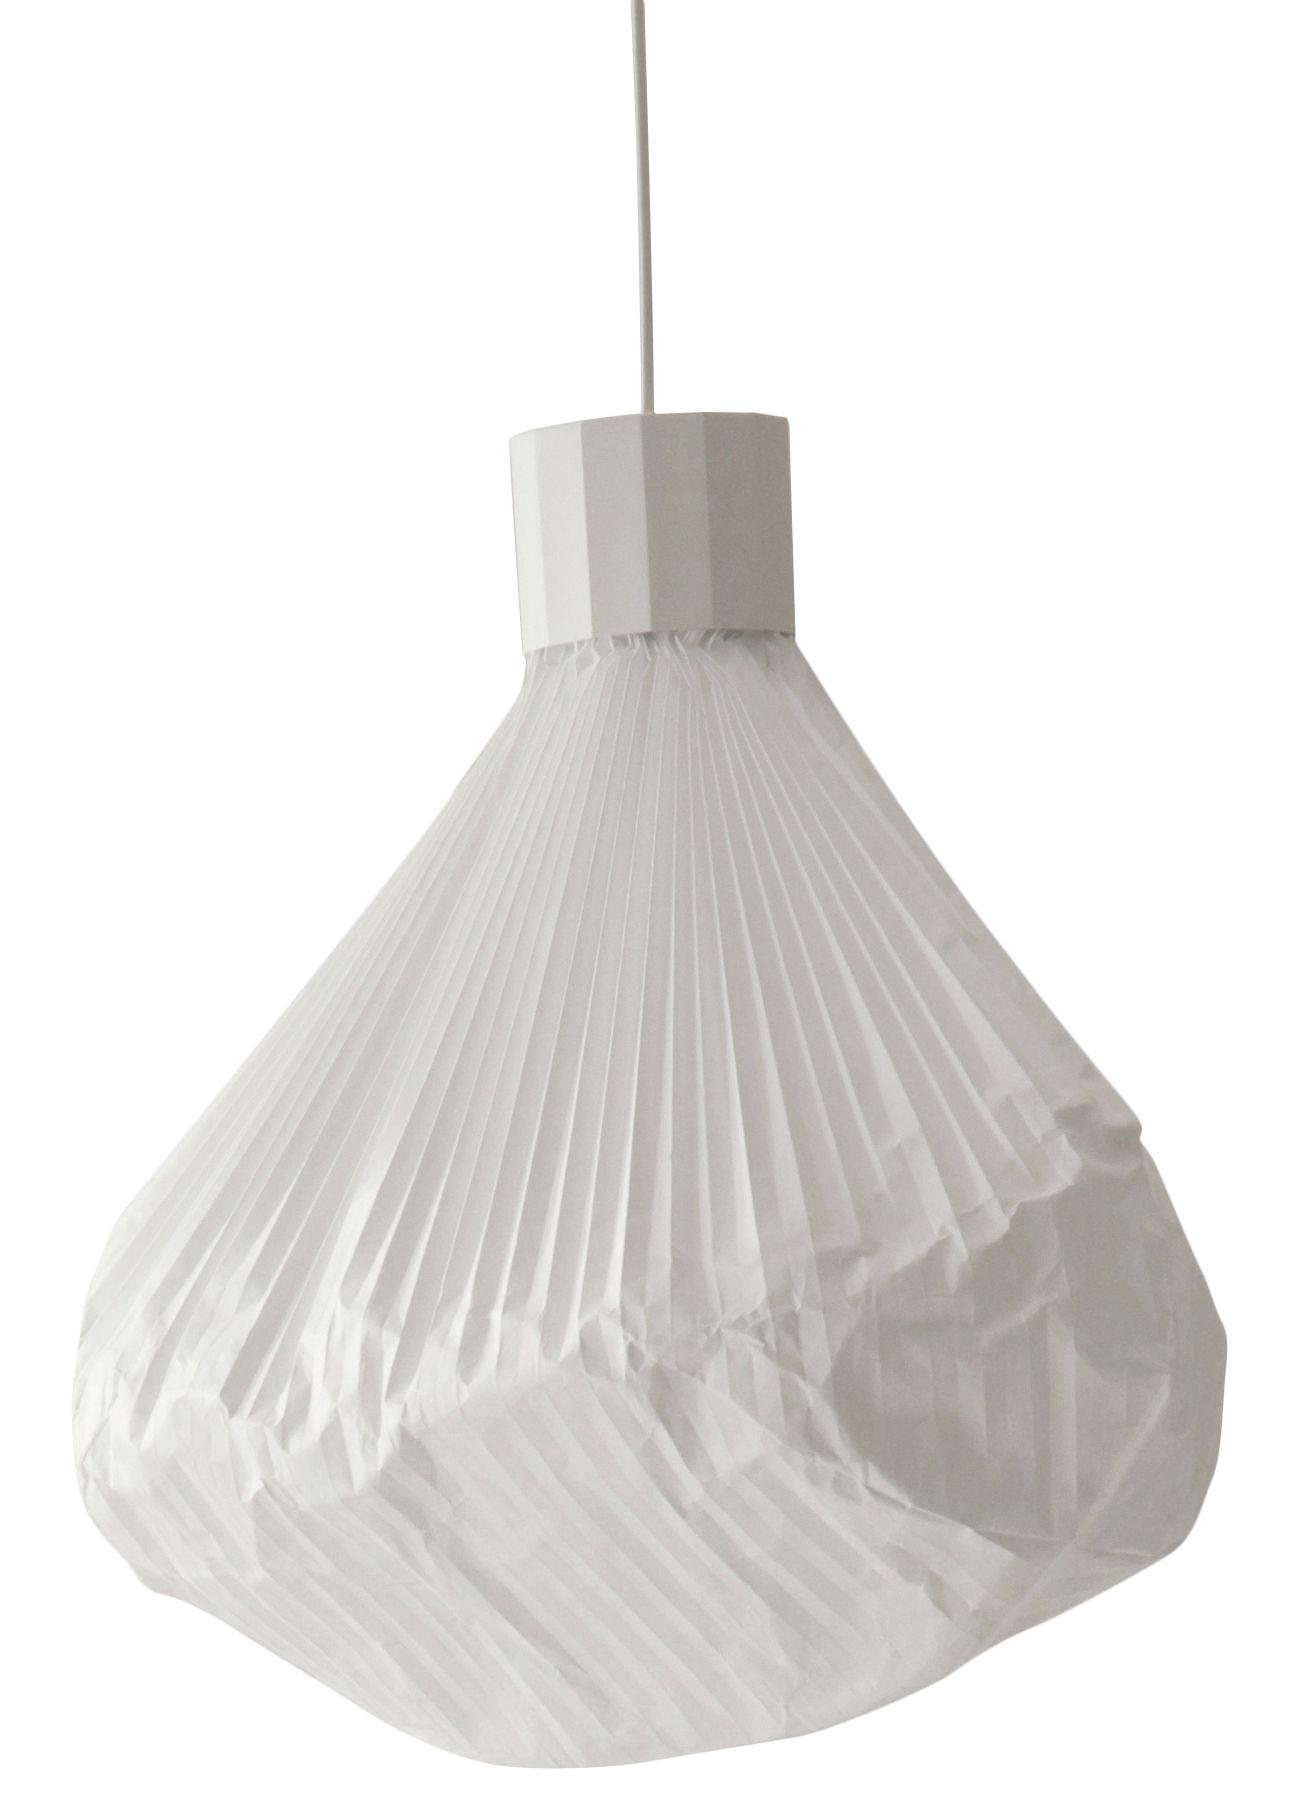 suspension vapeur base blanche diffuseur blanc moustache made in design. Black Bedroom Furniture Sets. Home Design Ideas